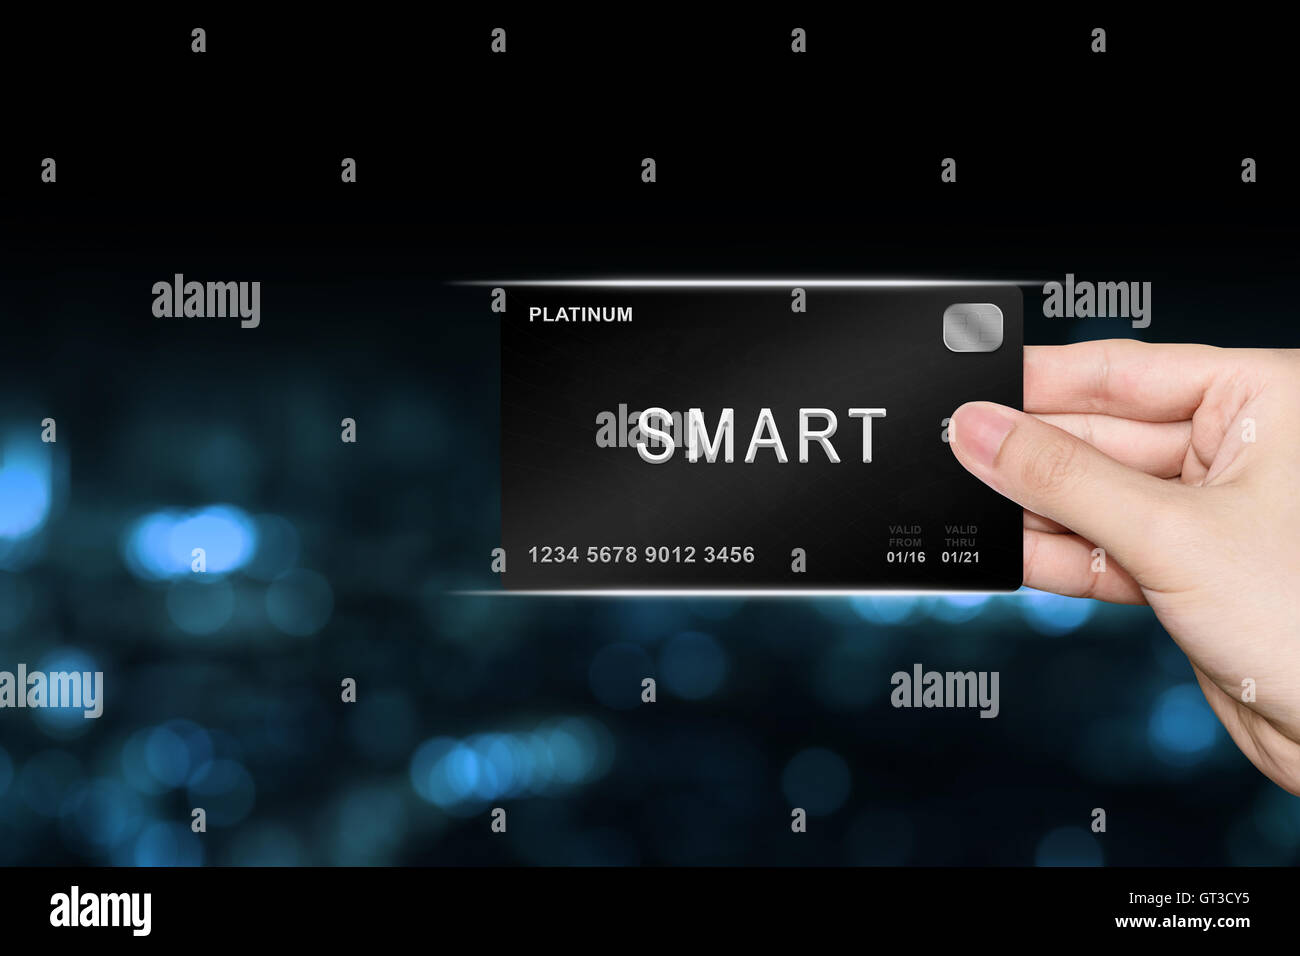 hand picking smart platinum card on blur background - Stock Image